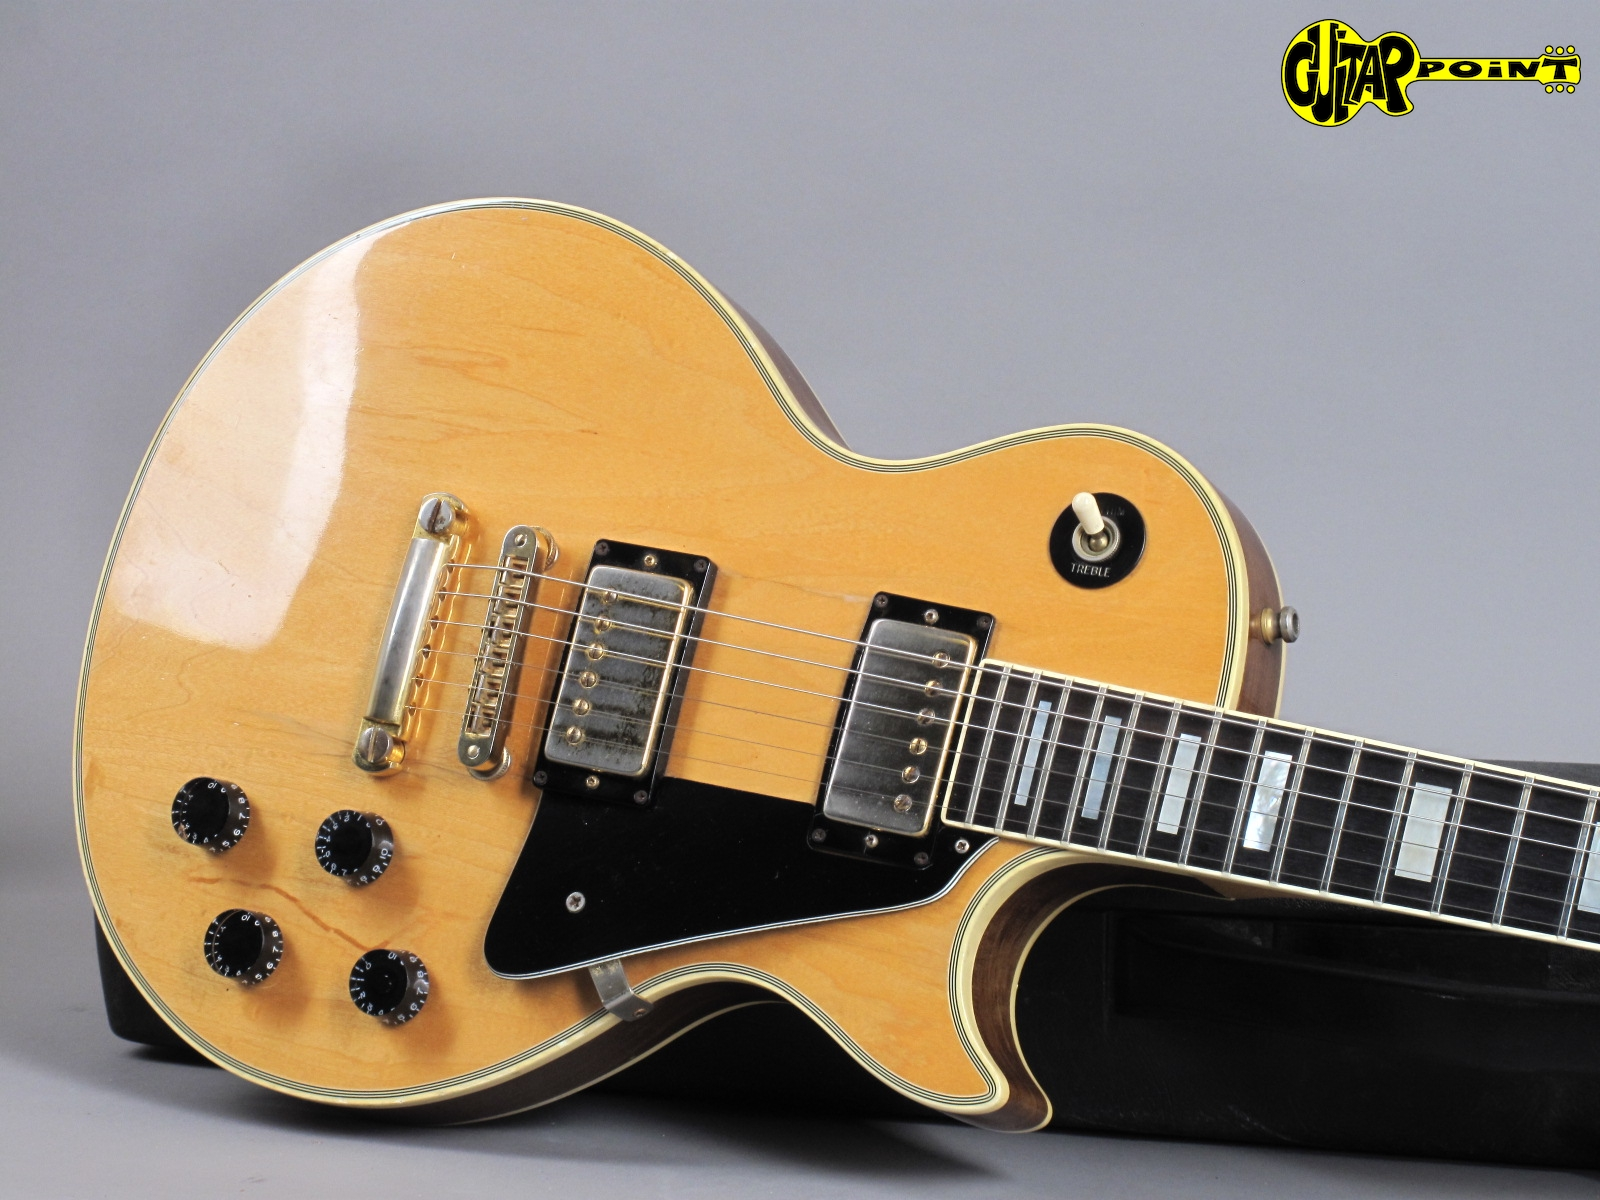 https://guitarpoint.de/app/uploads/products/1979-gibson-les-paul-custom-natural/Gibson79LPCstNT72089529_19.jpg